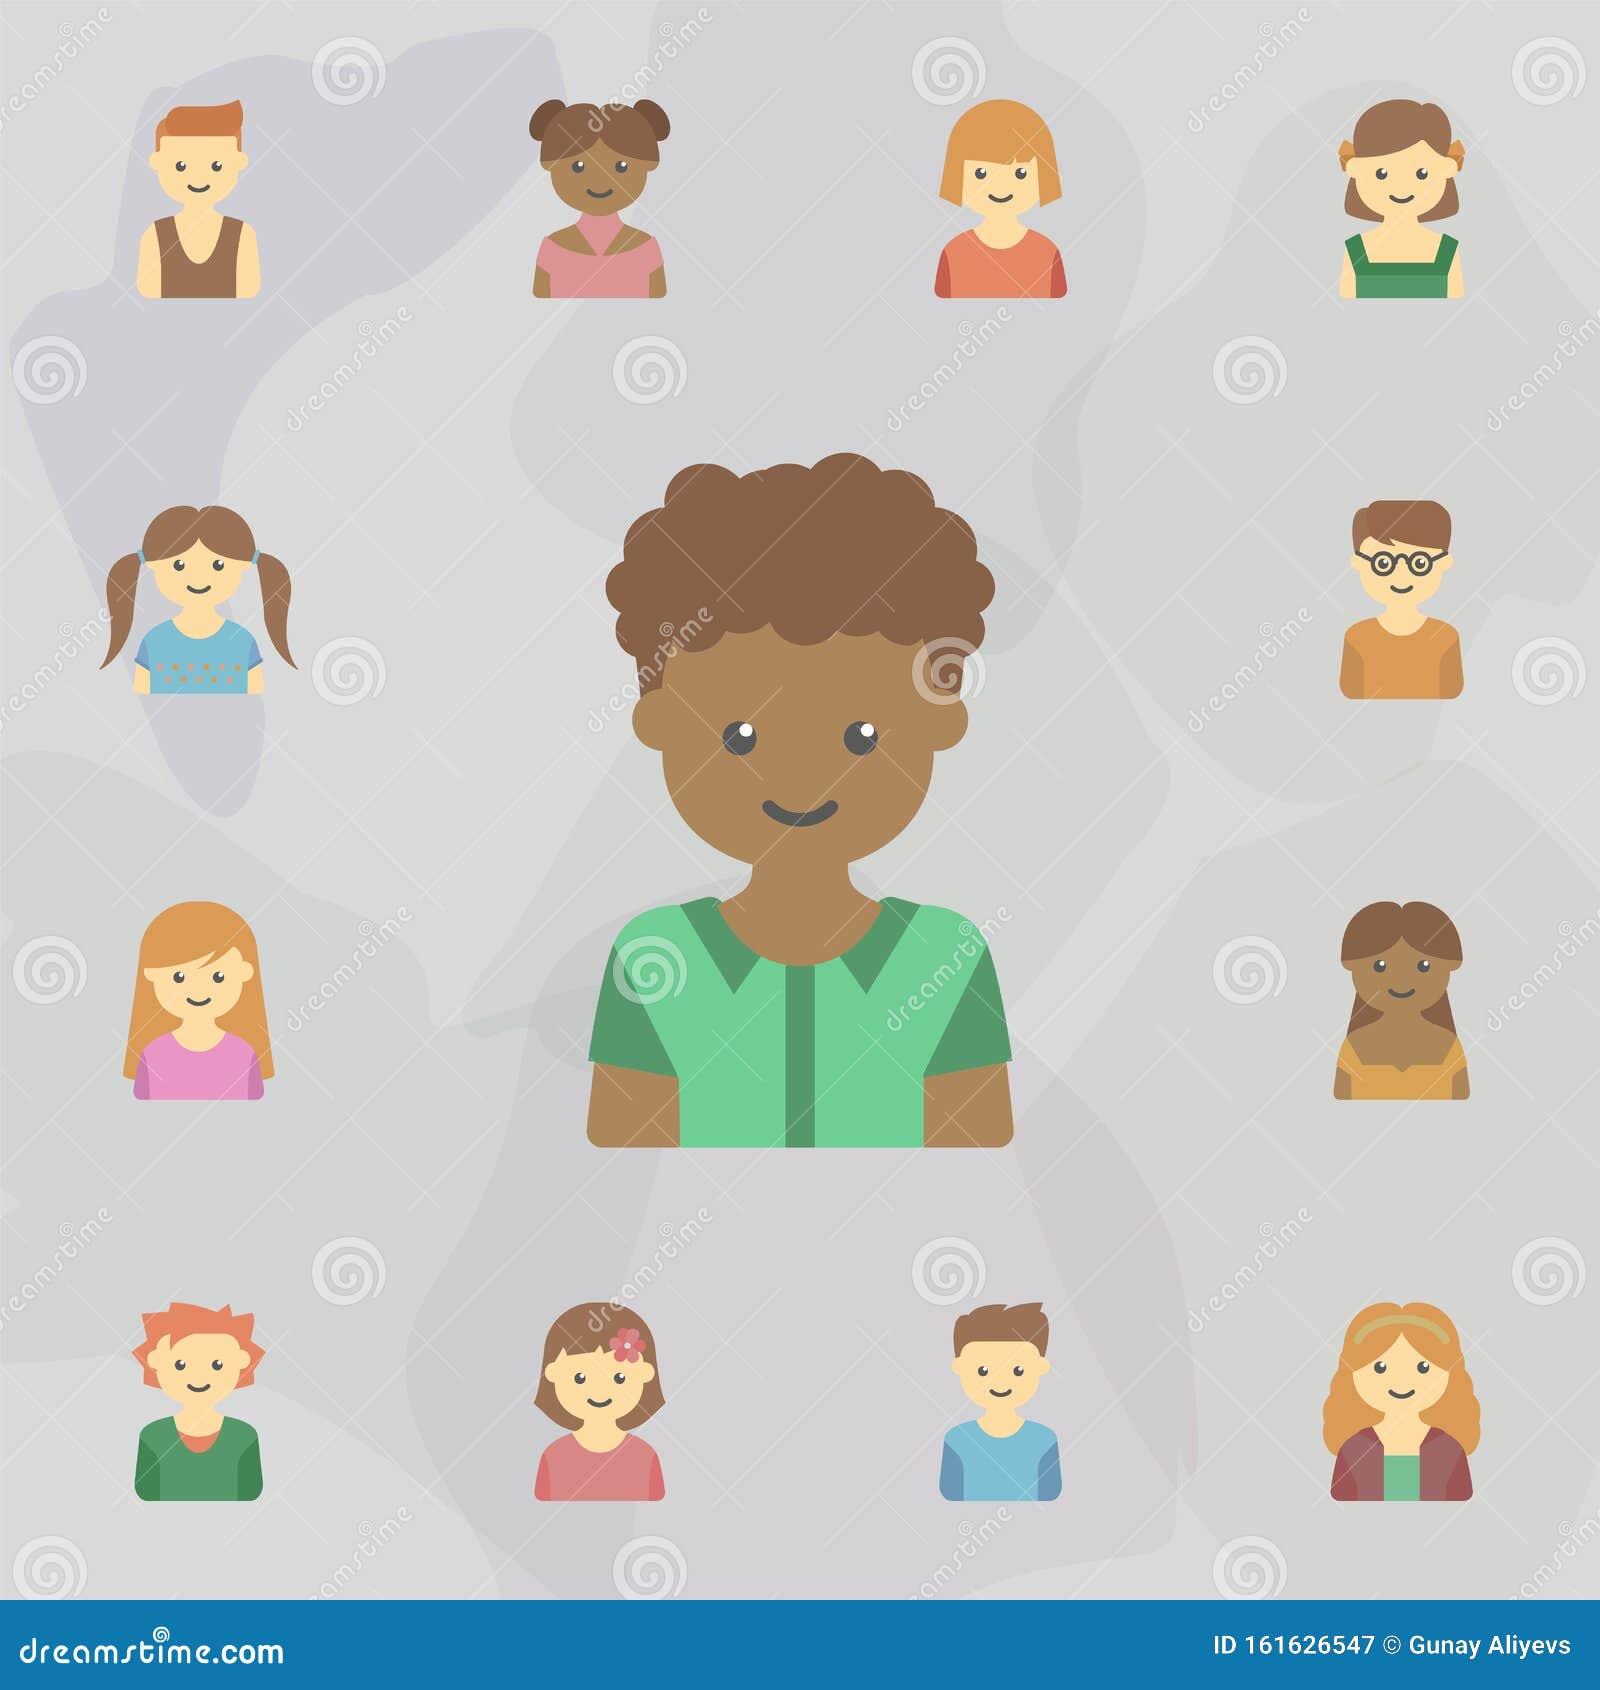 Avatar Of Black Guy Colored Icon Universal Set Of Kids Avatars For Website Design And Development App Development Stock Illustration Illustration Of Happy Icon 161626547